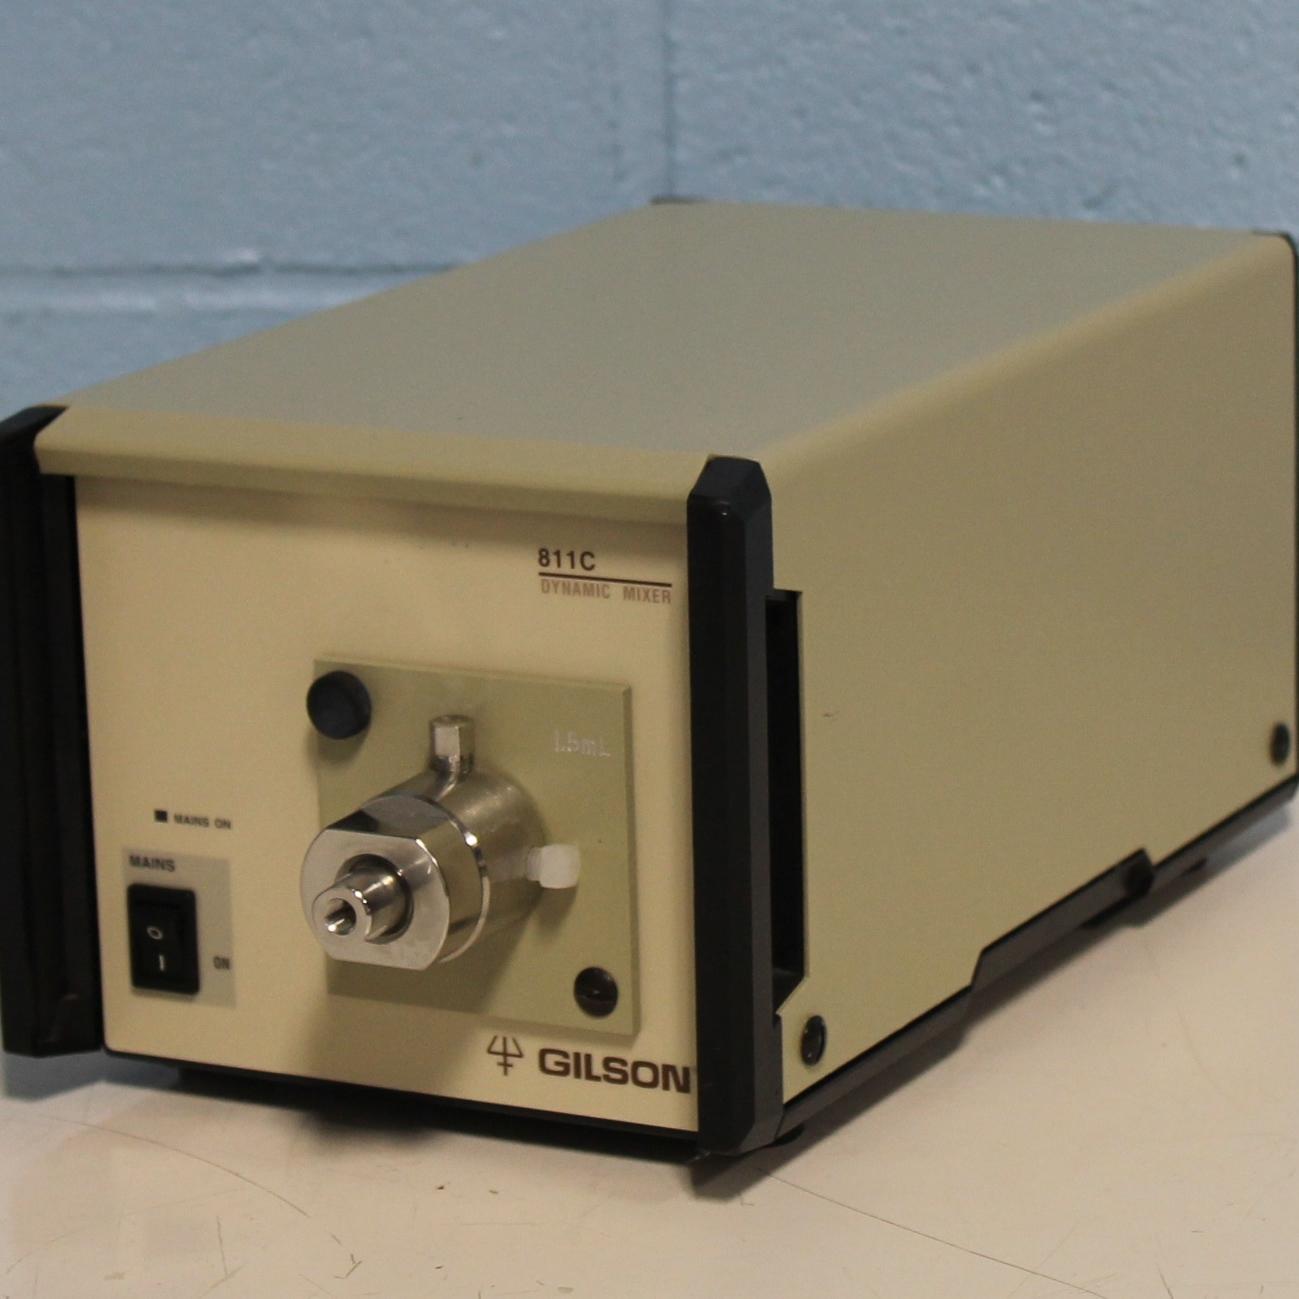 Gilson 811C Dynamic Mixer Image